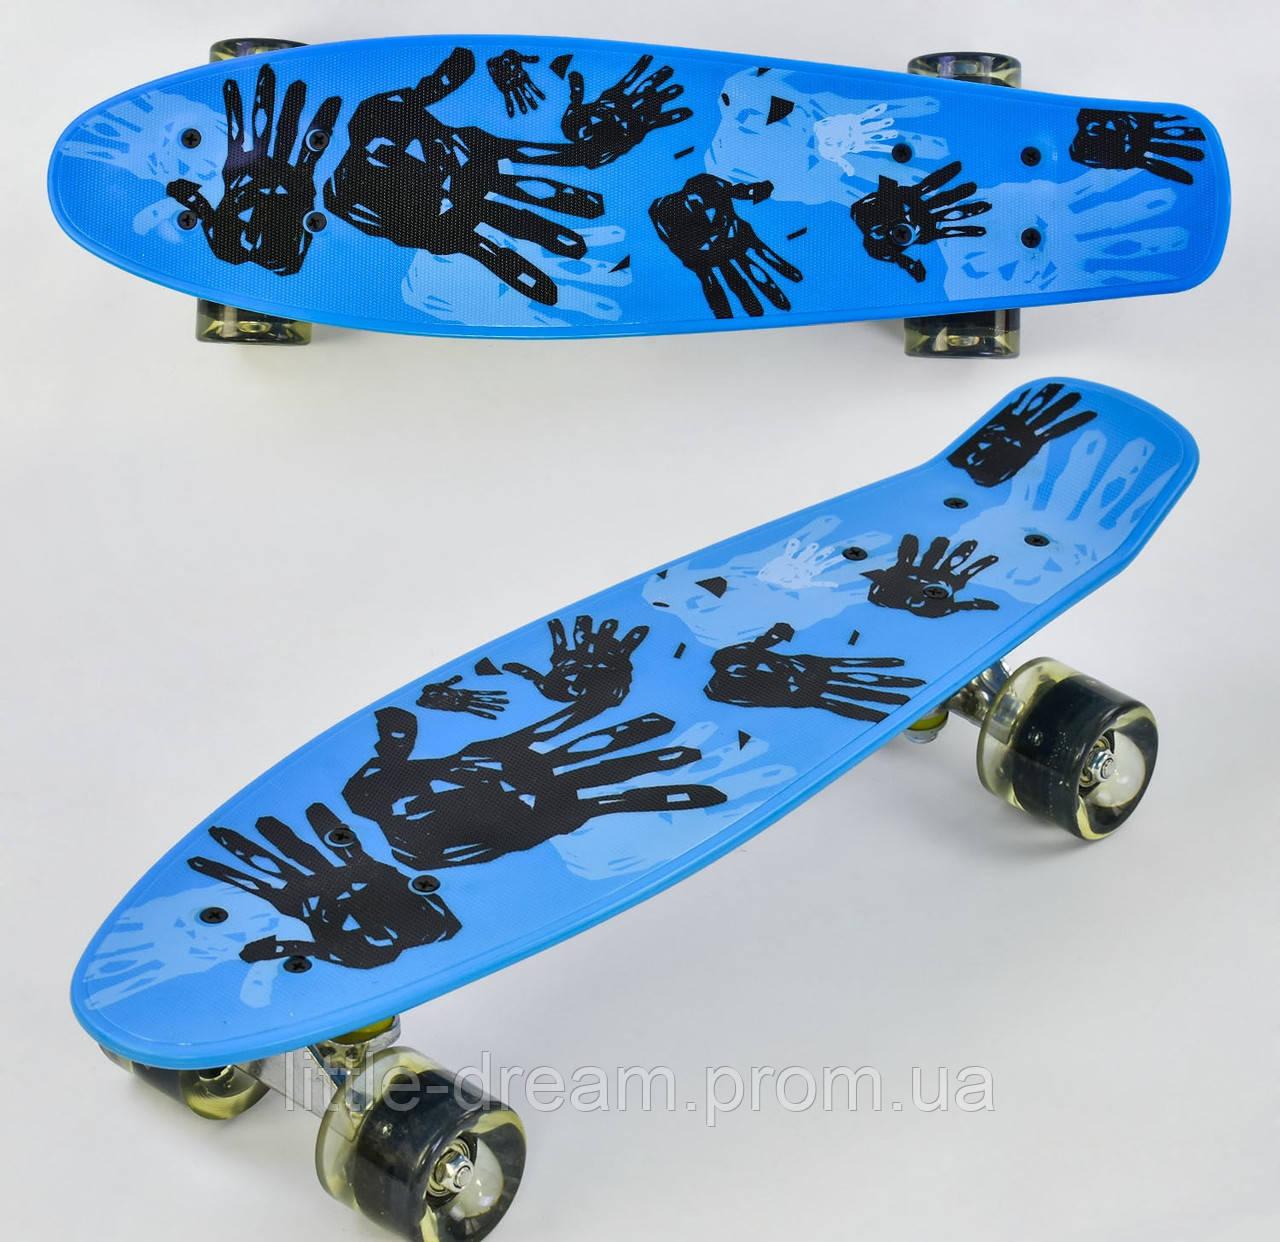 Пенниборд ( Скейтборд ) лонгборд  Best Board  колеса с подсветкой, доска 55 см нагрузка до 80 кг, голубой